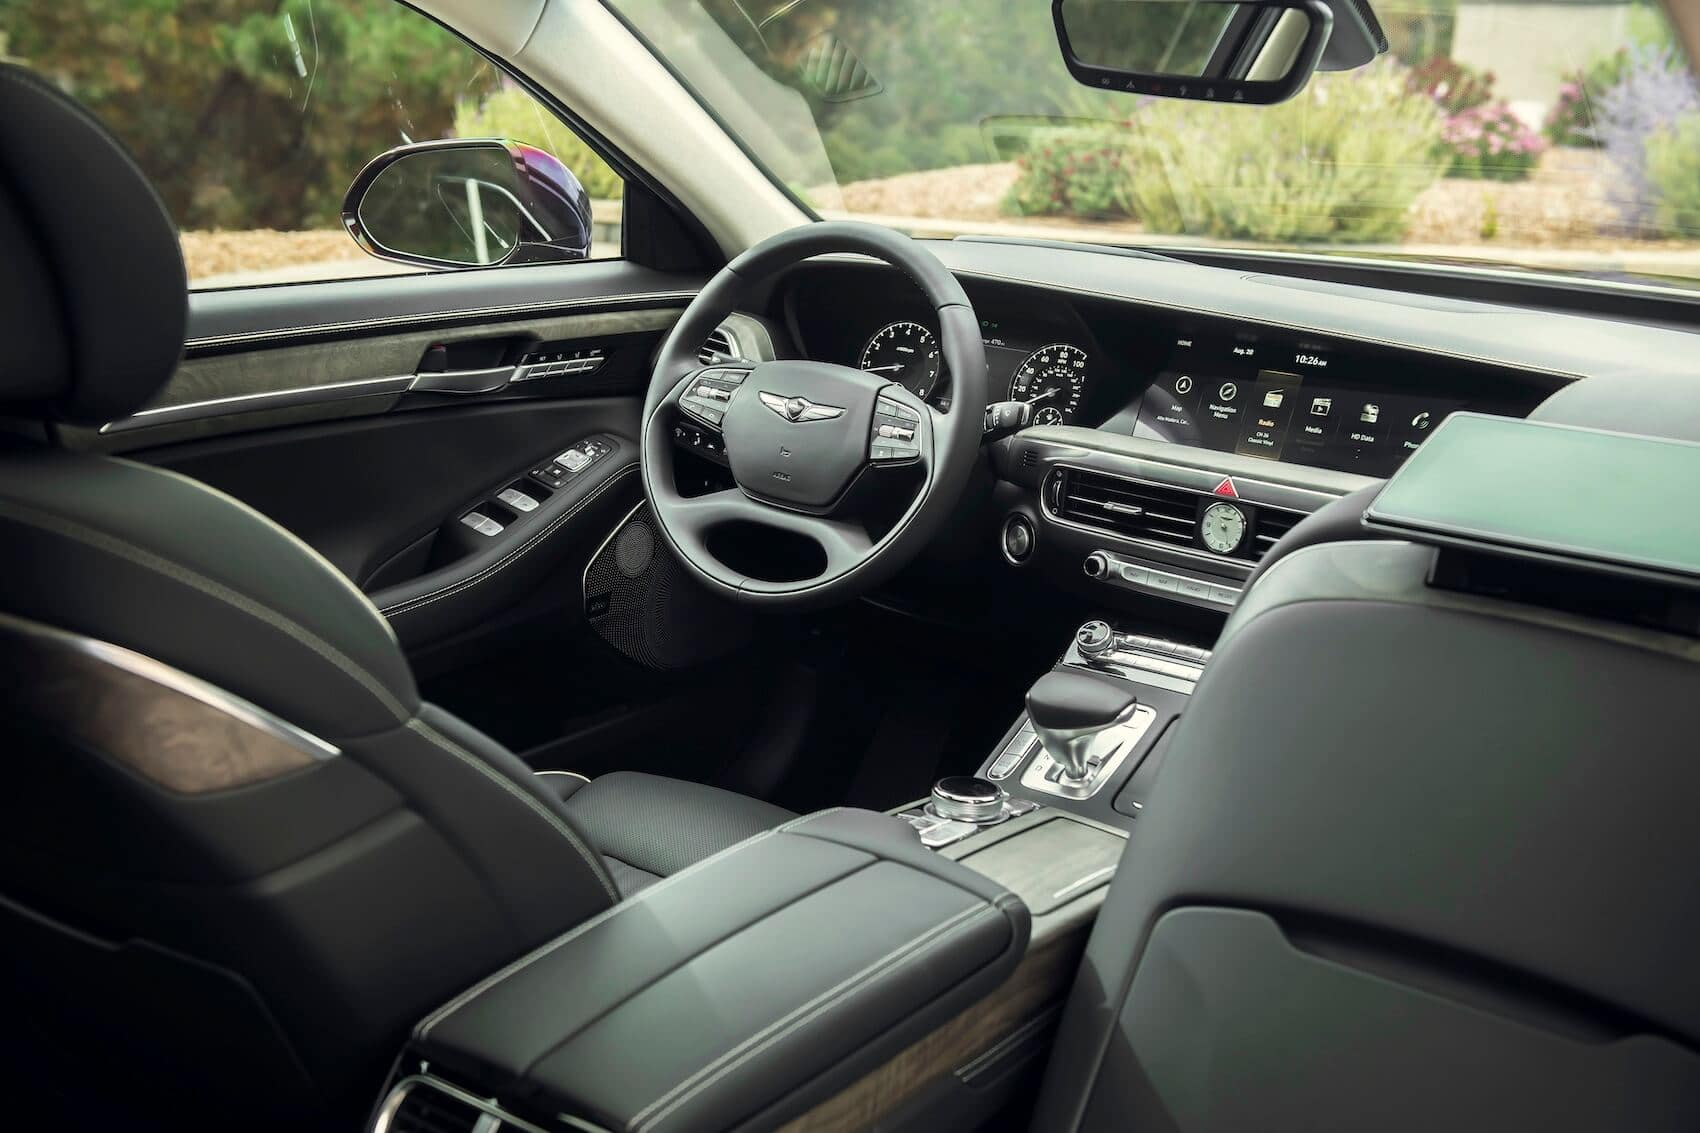 Genesis G90 Interior: Technology Highlights